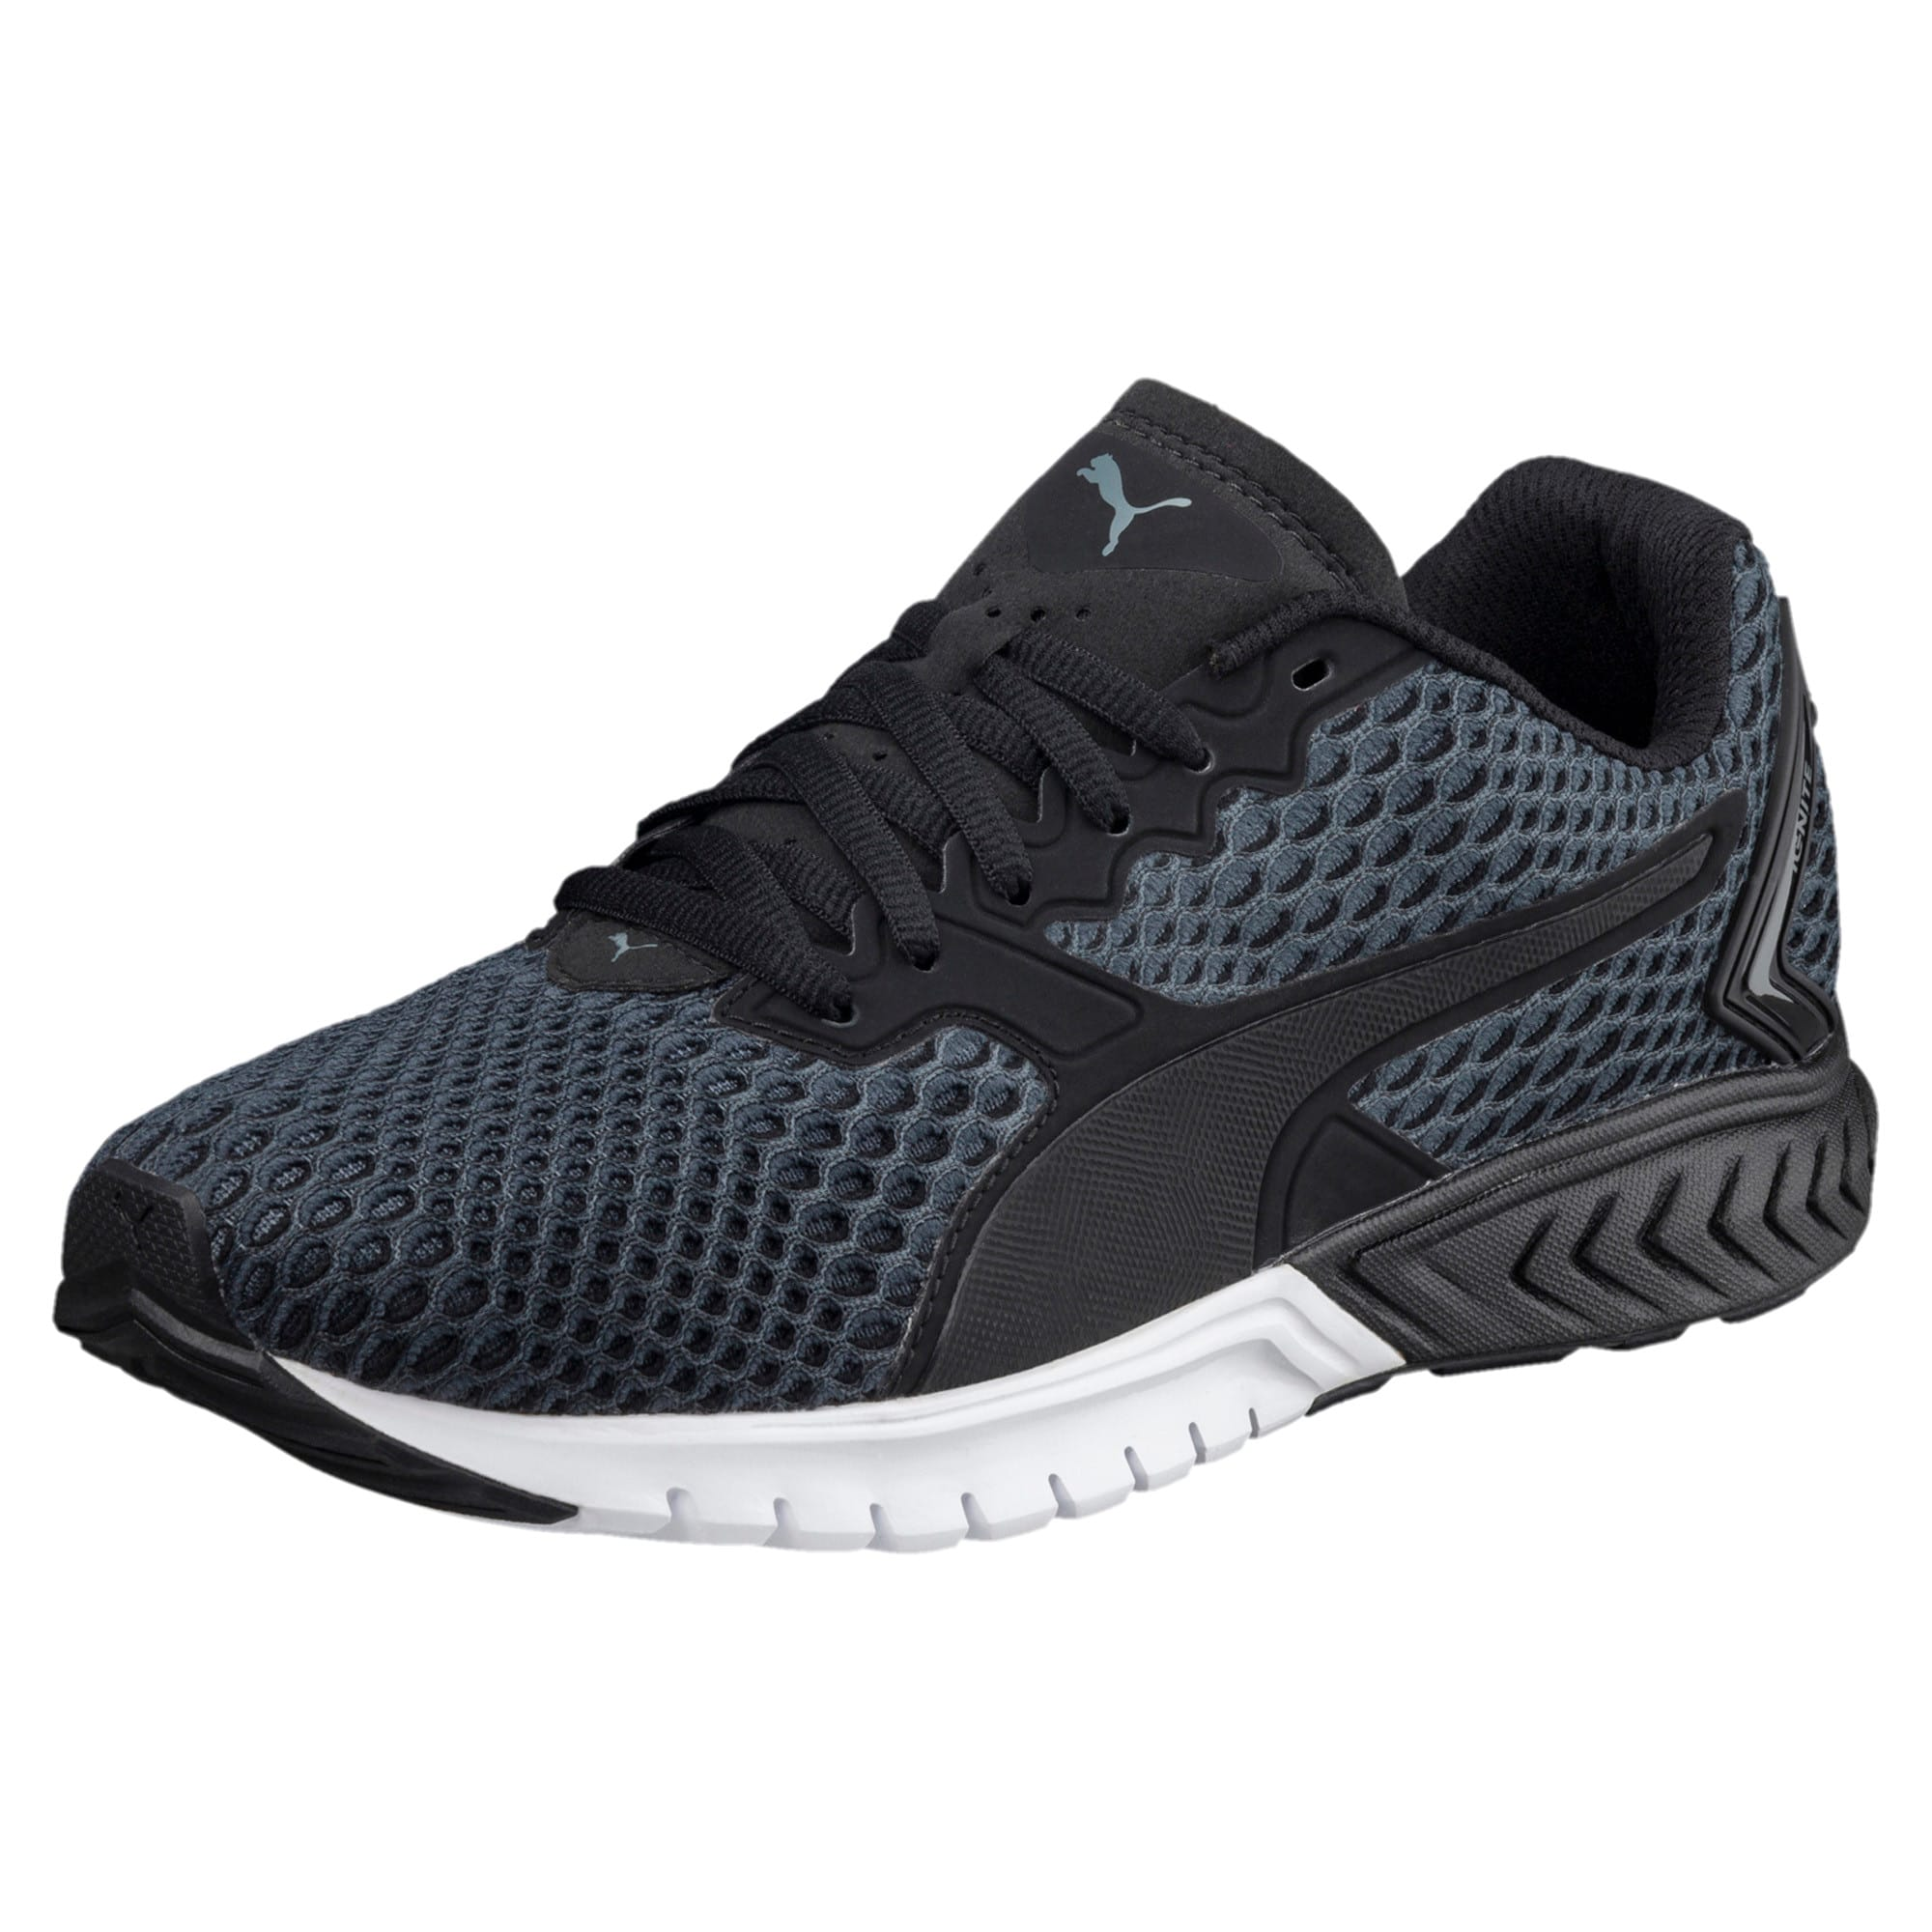 Thumbnail 1 of IGNITE Dual New Core Women's Training Shoes, Puma Black-Asphalt, medium-IND